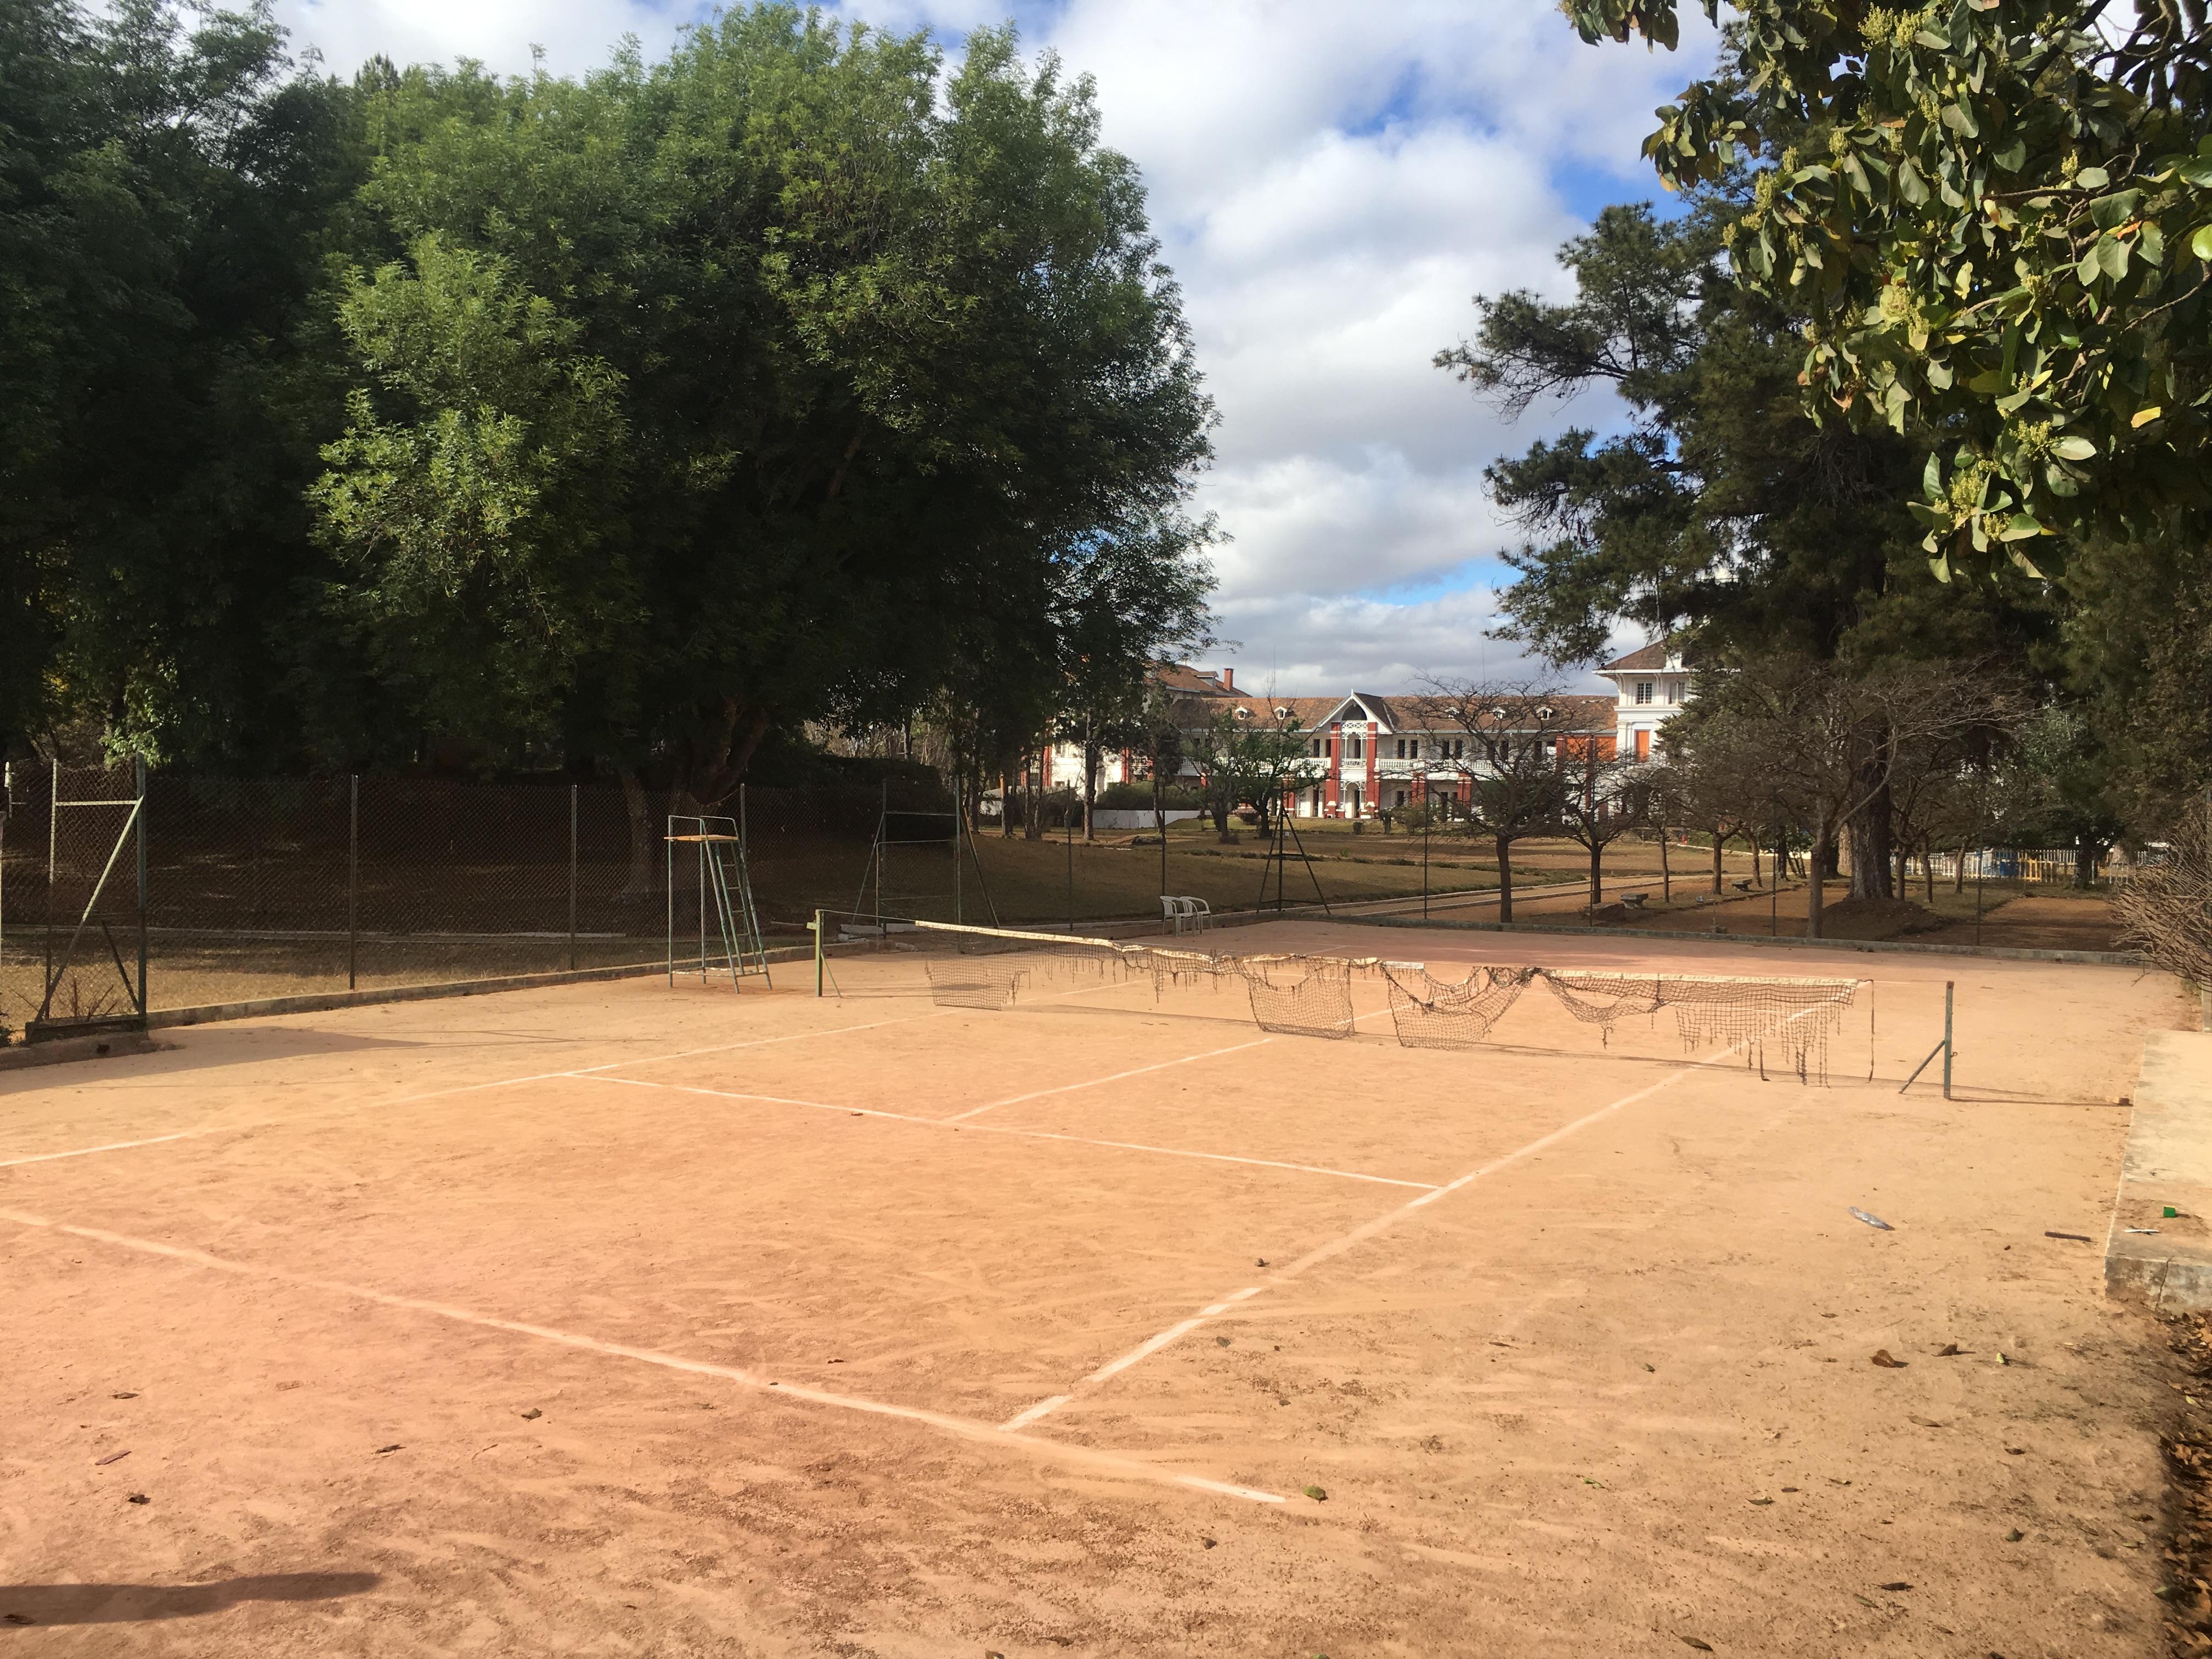 Terrain Tennis Terre battue, Madagasca